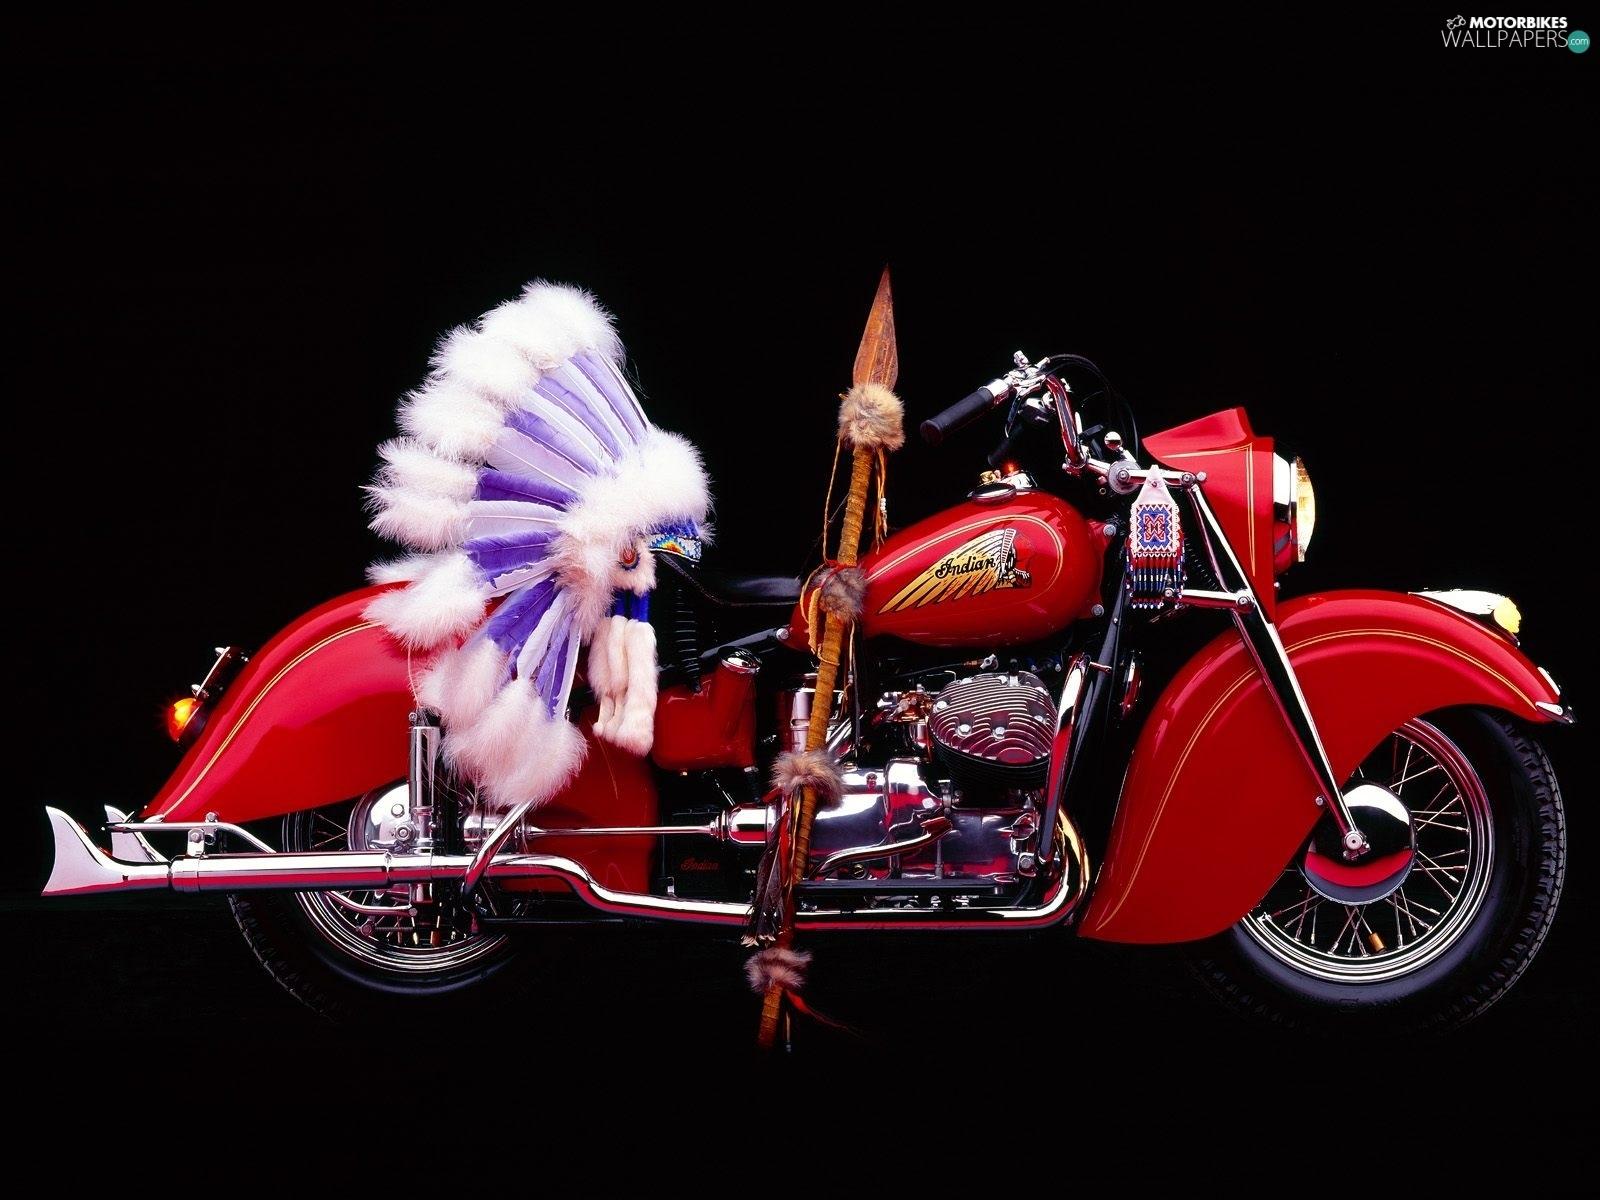 Indian 1941 Motor Bike Motorbikes Wallpapers 1600x1200